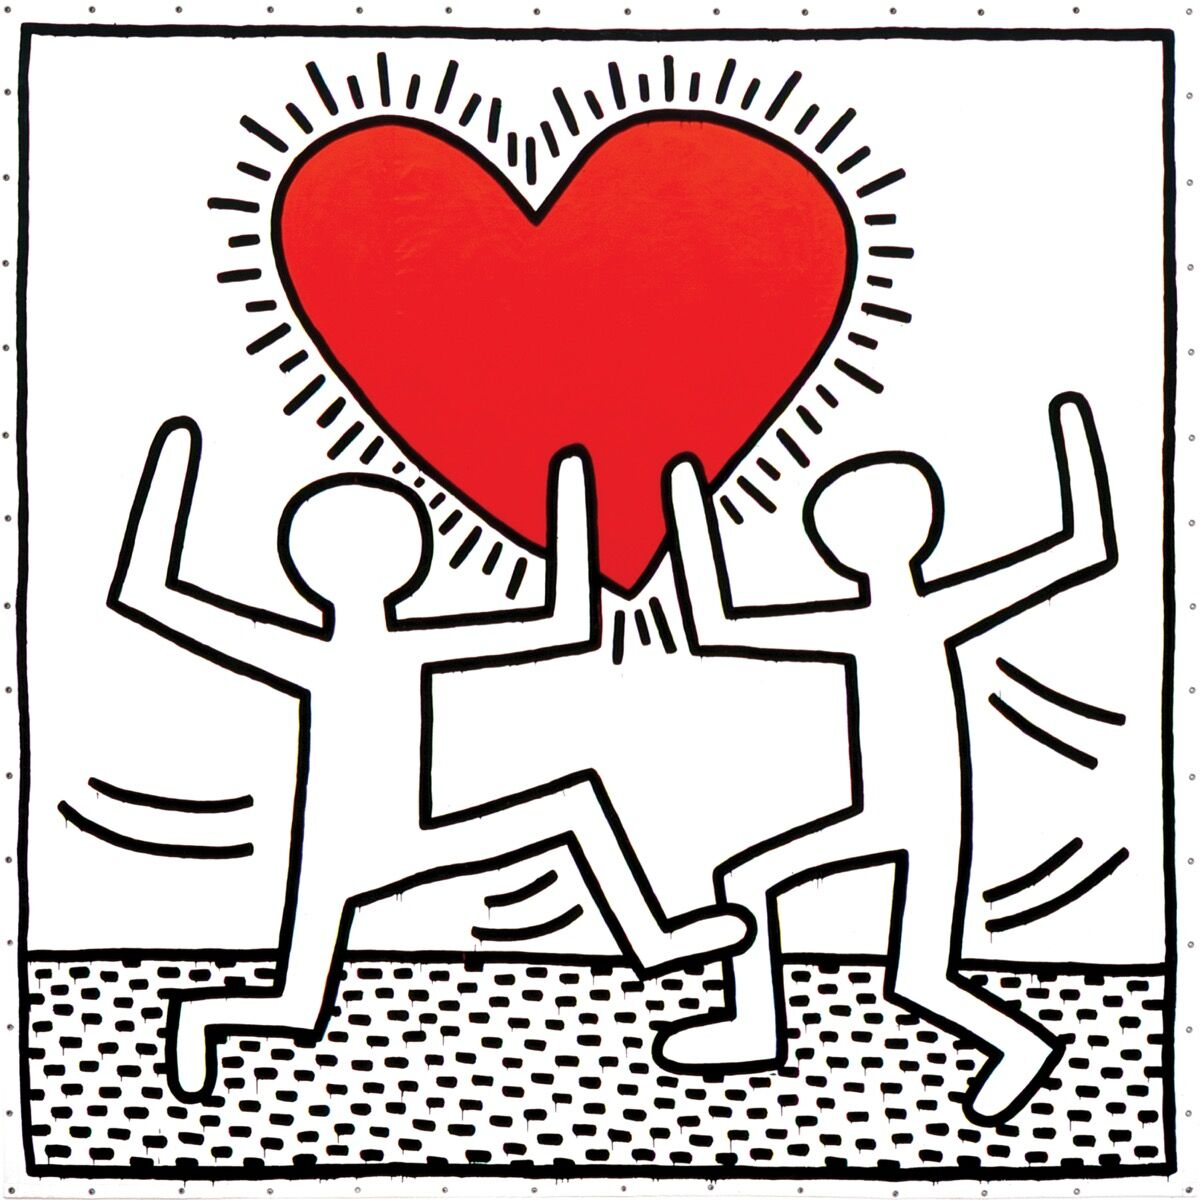 Keith Haring, Untitled, 1982. © Keith Haring Foundation.